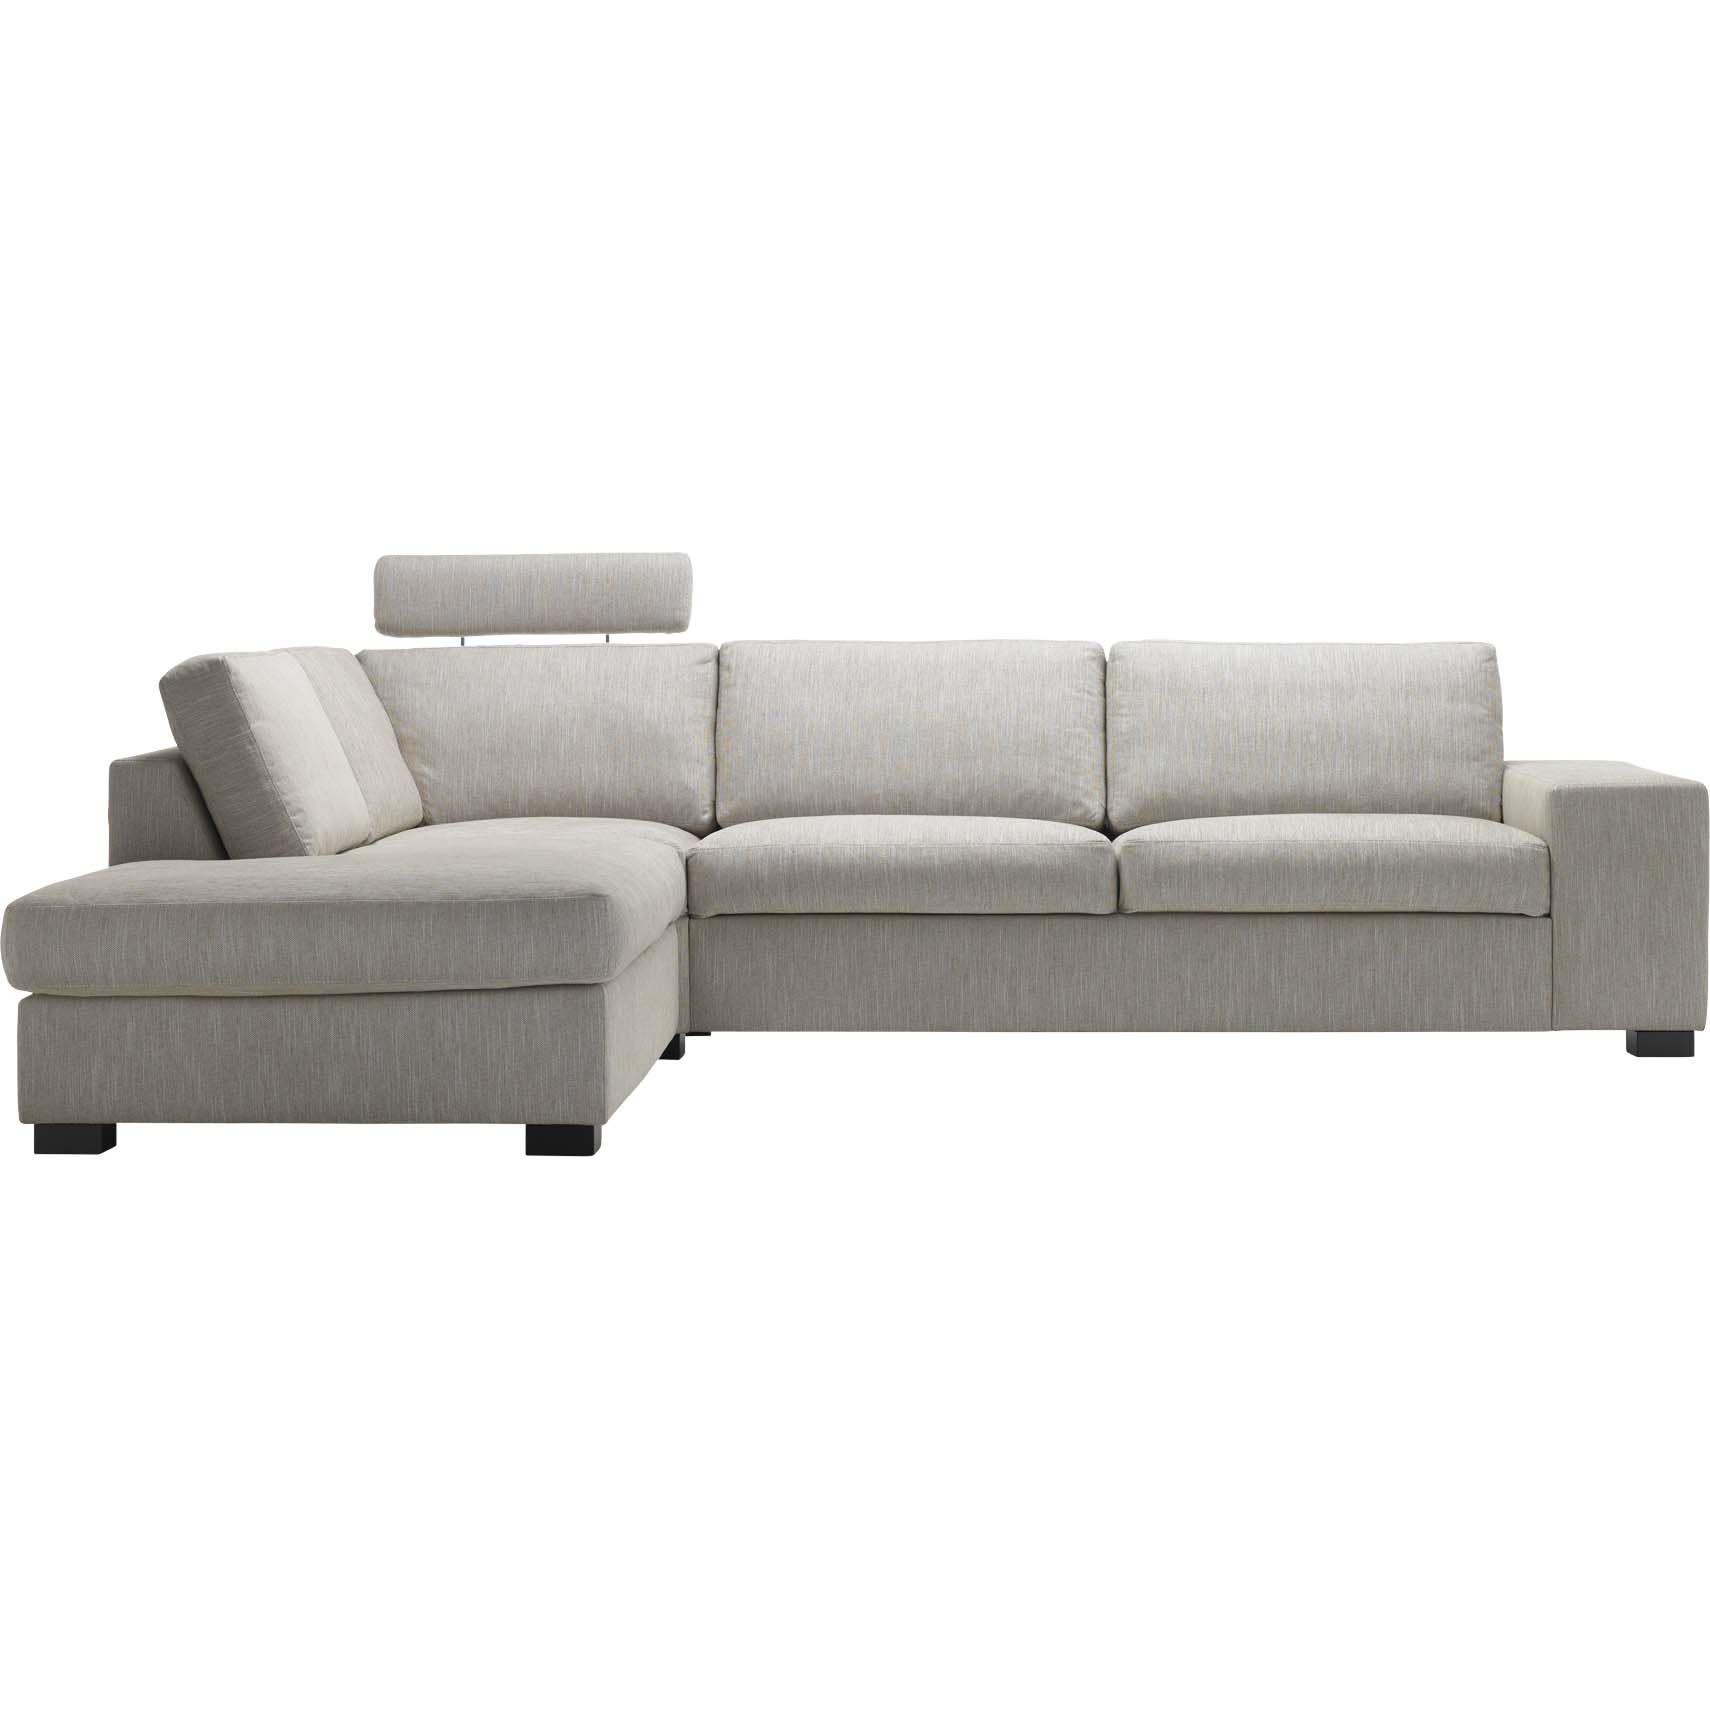 Sofa IDdesign 111 Sofas & Seats Pinterest